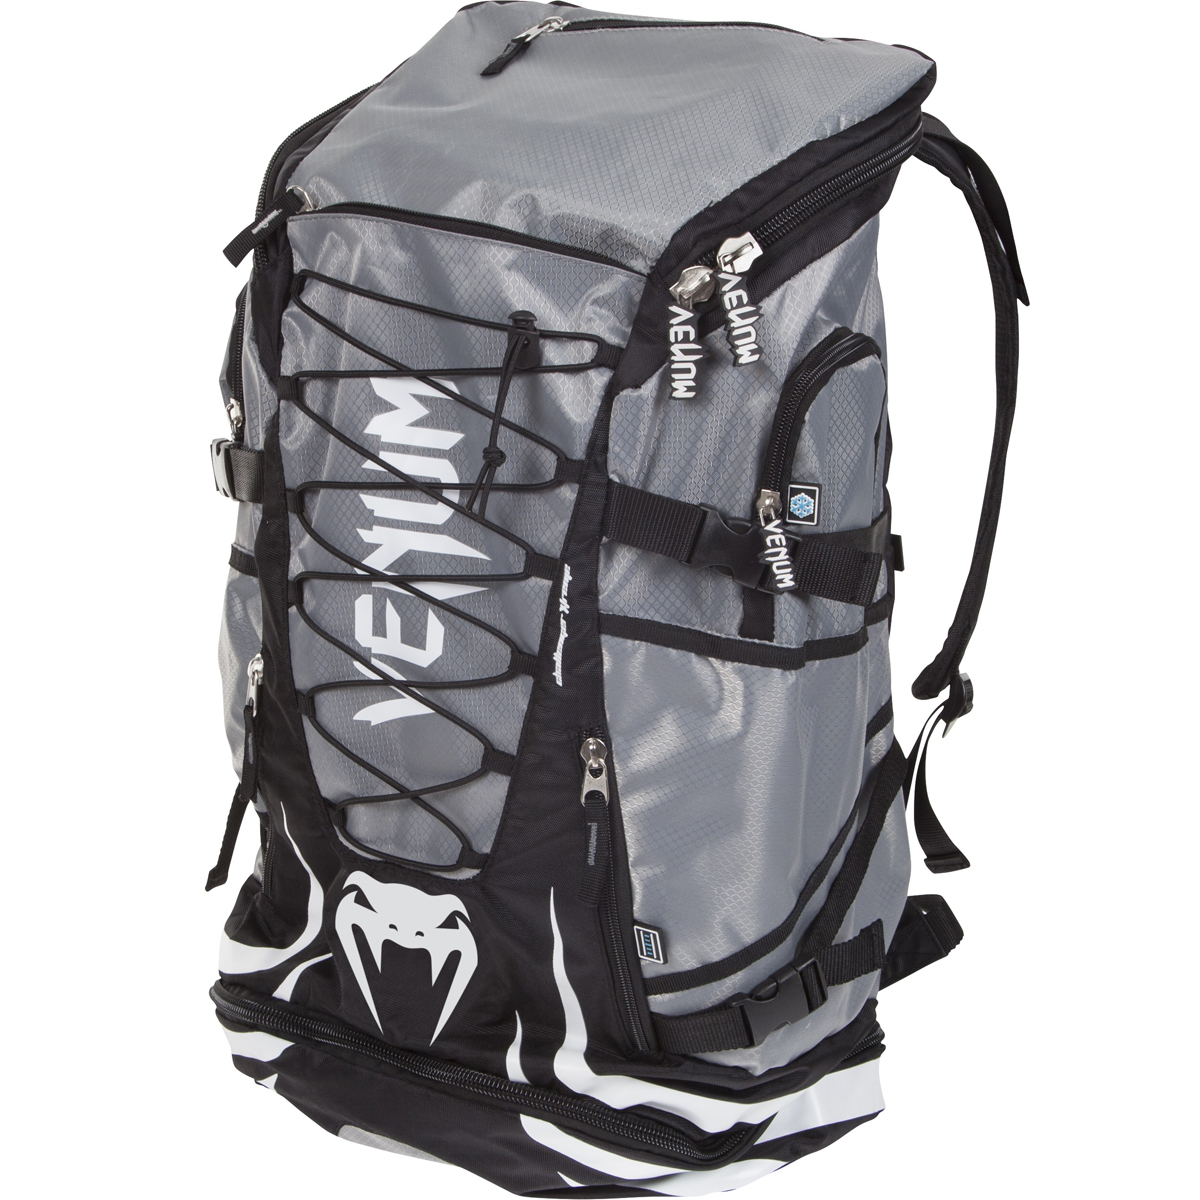 Venum Challenger Xtreme Backpack - Black/Gray